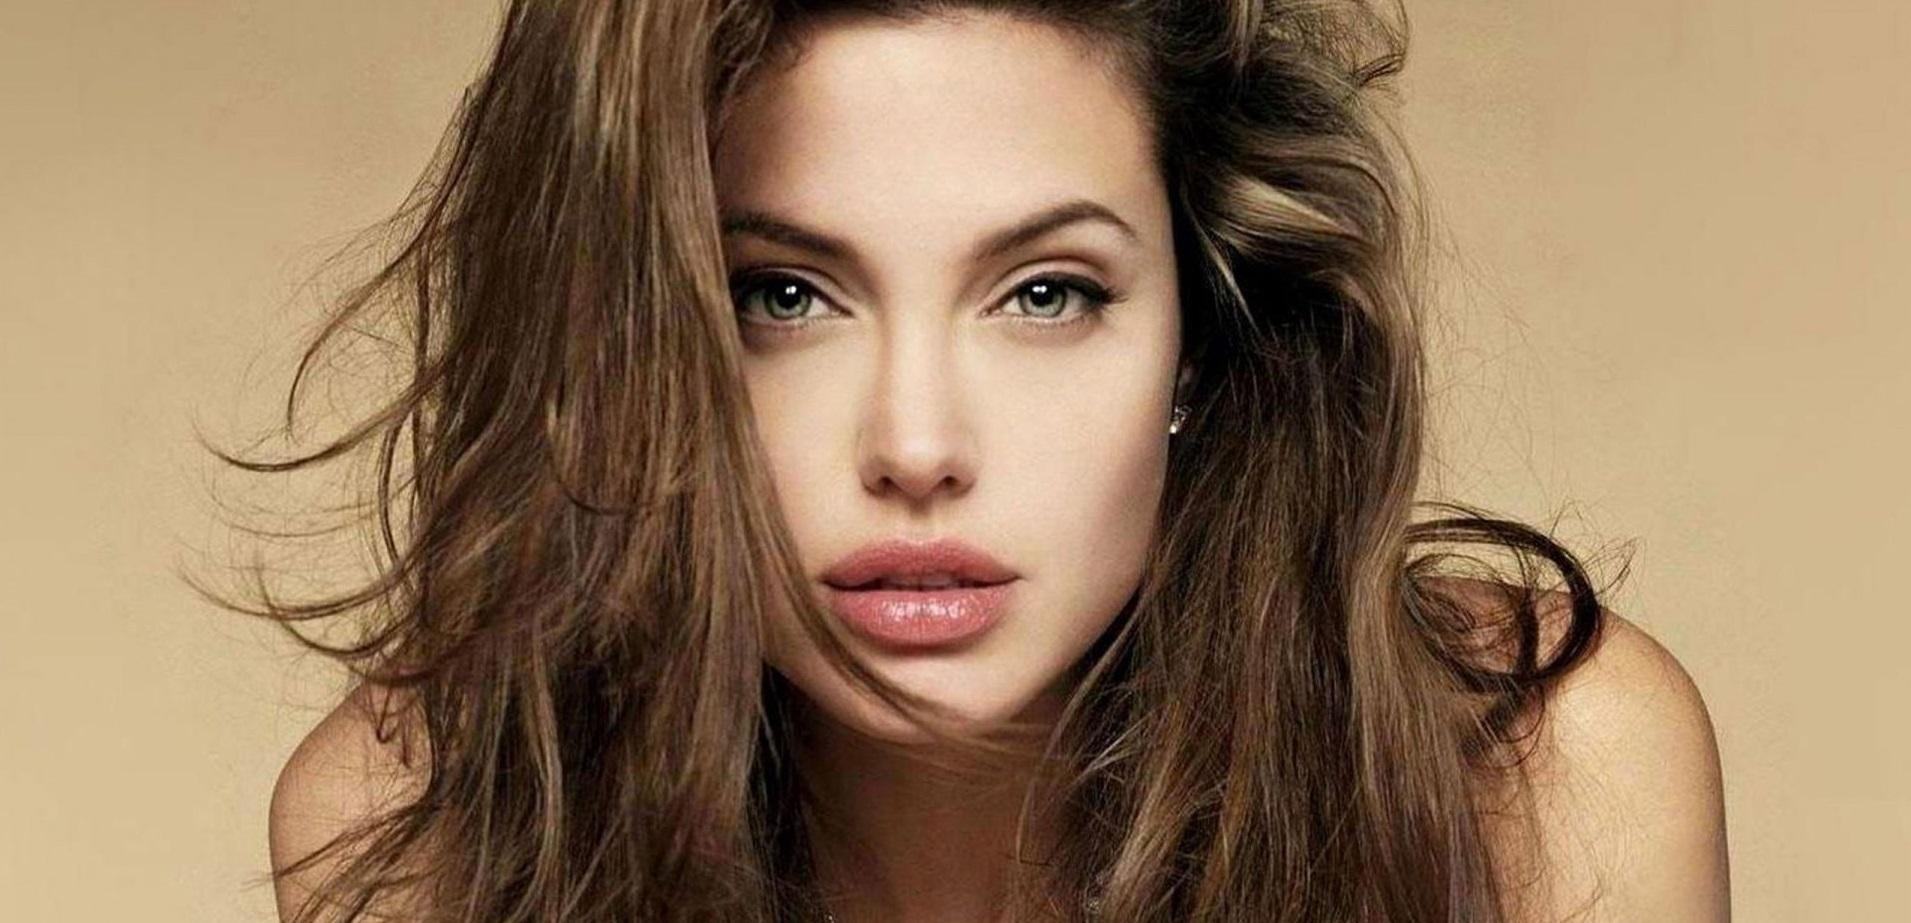 Angelina-Jolie_20140314010757c3f.jpg